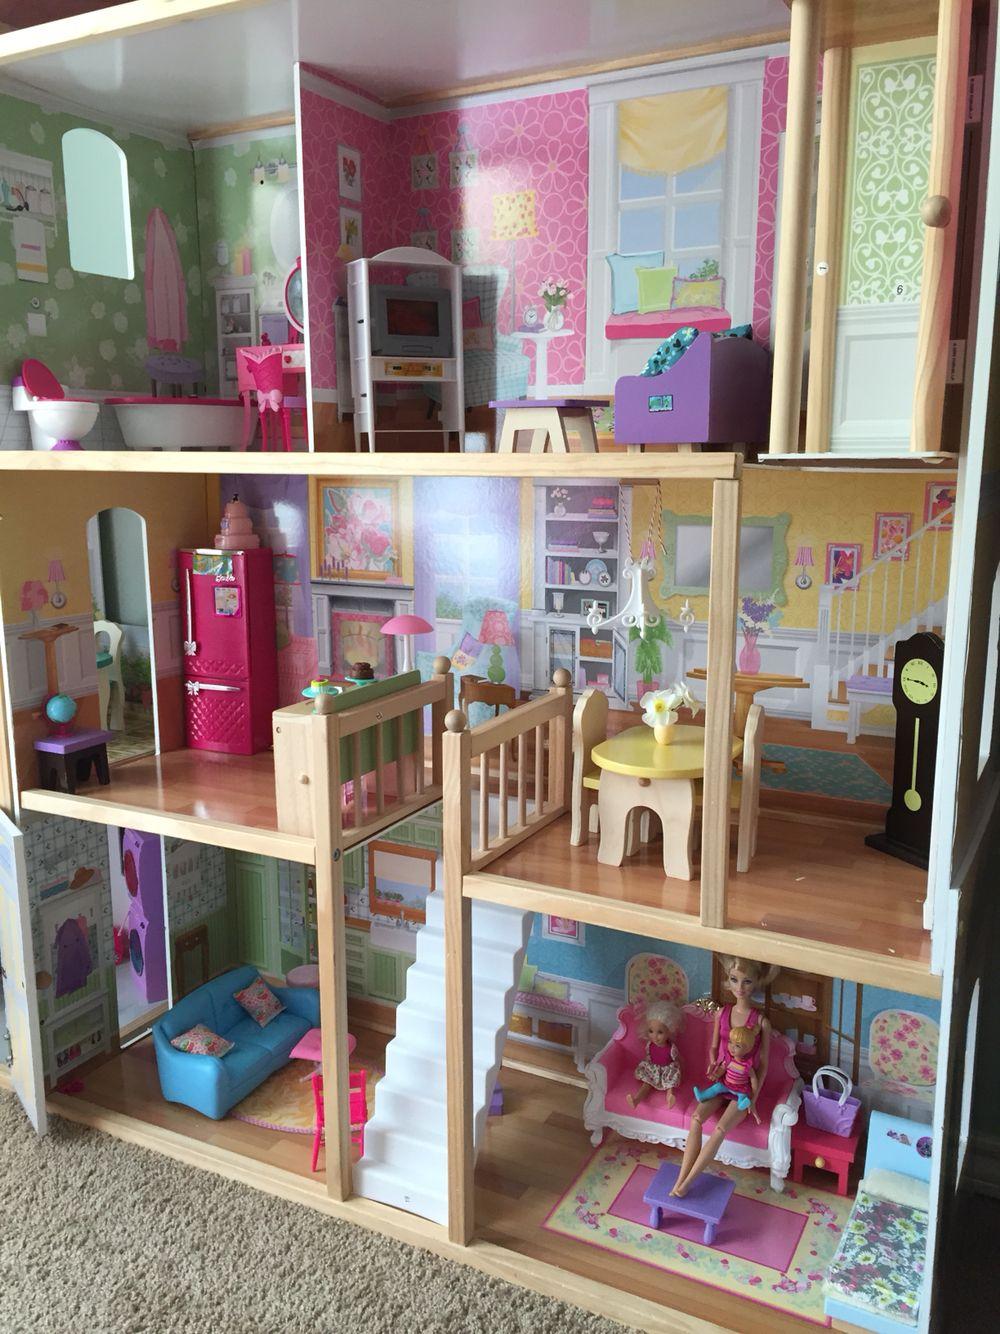 Barbie decorate house